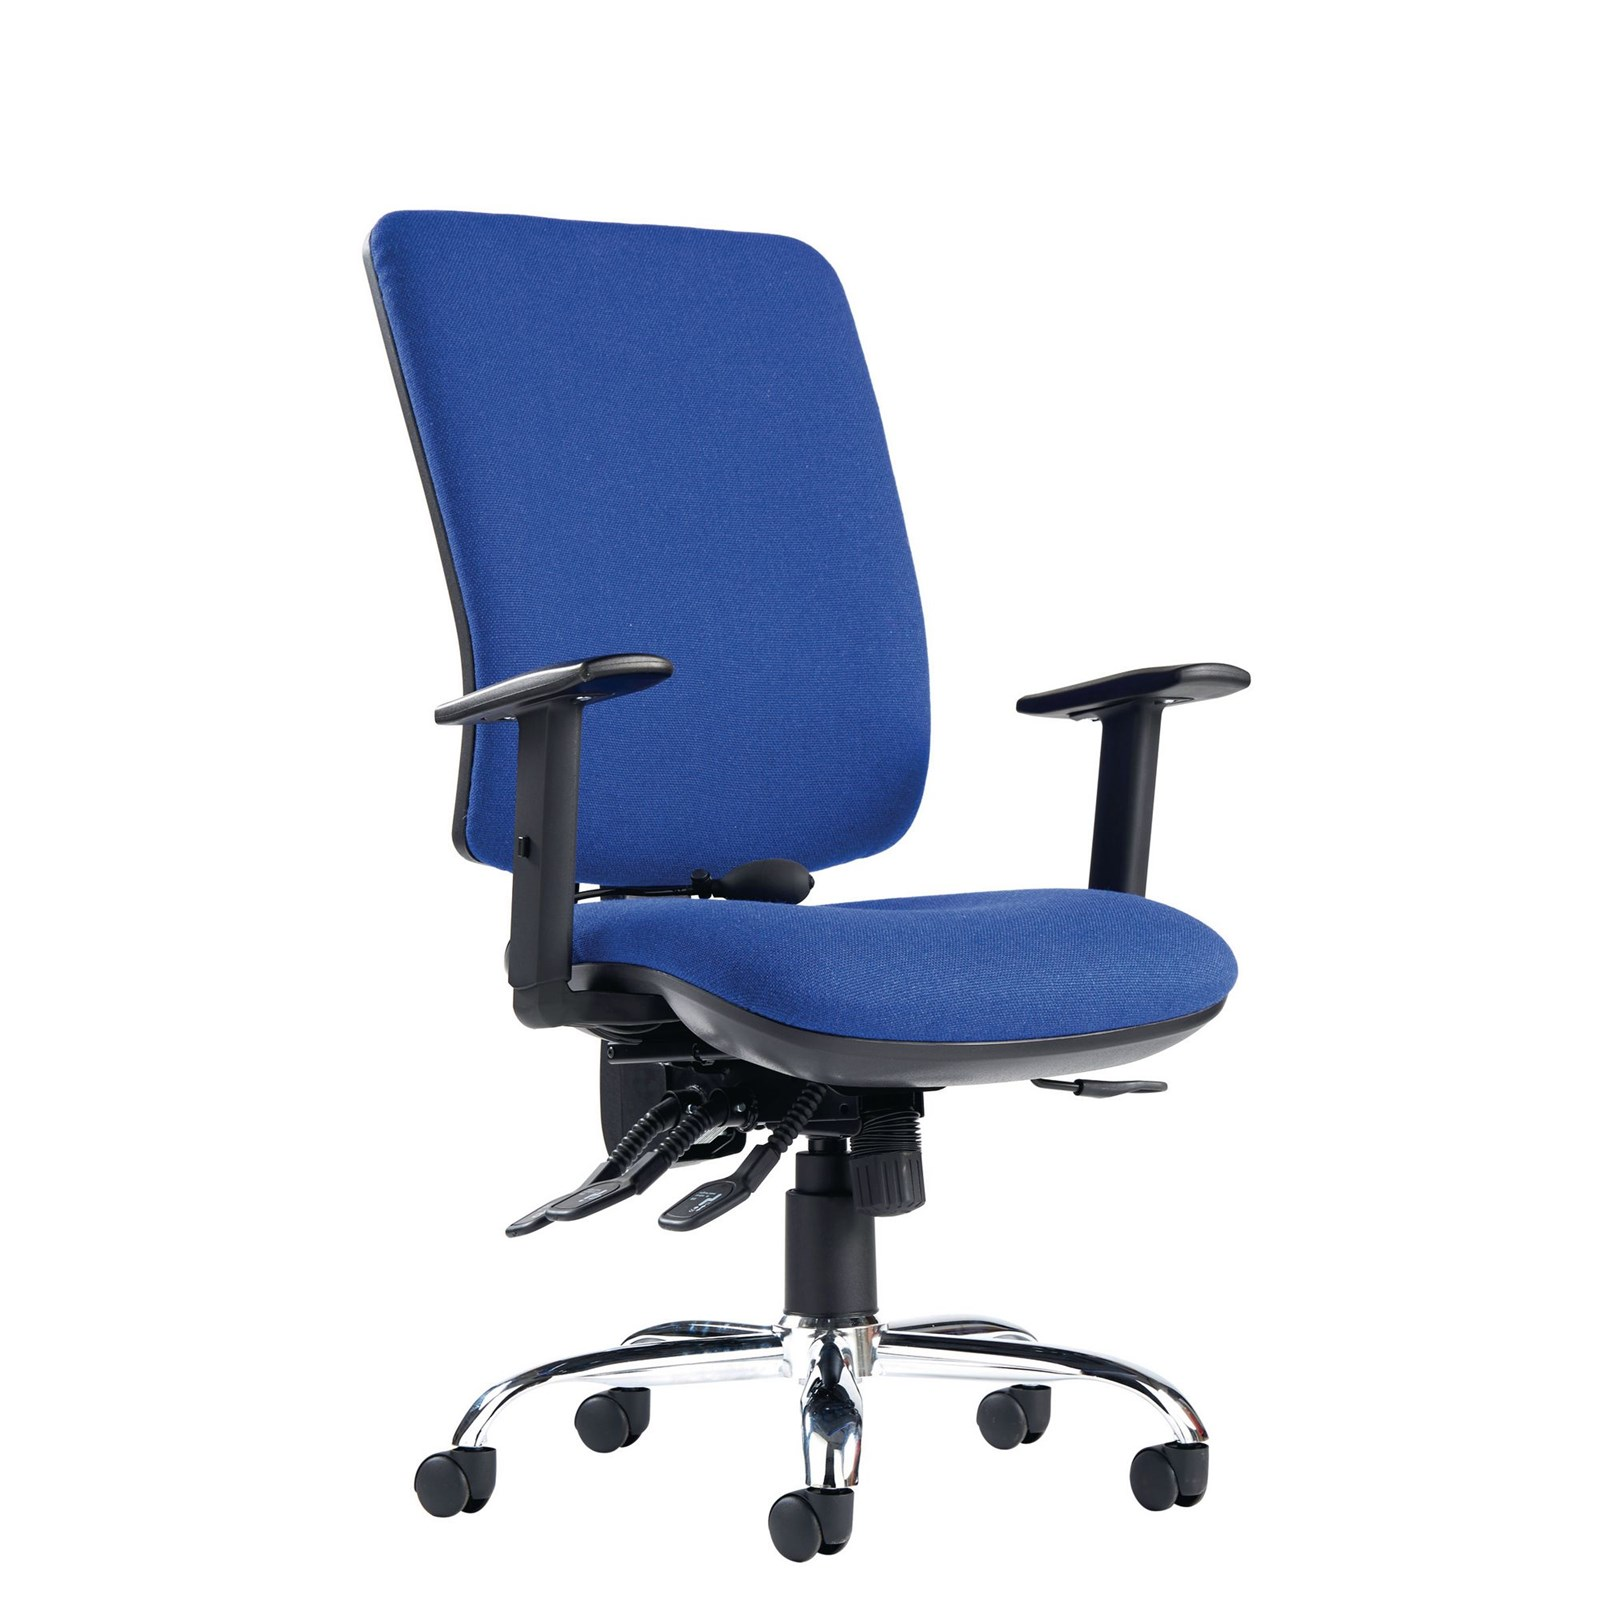 Senzaergo Chair Asynchro Adjst Arm Brgdy